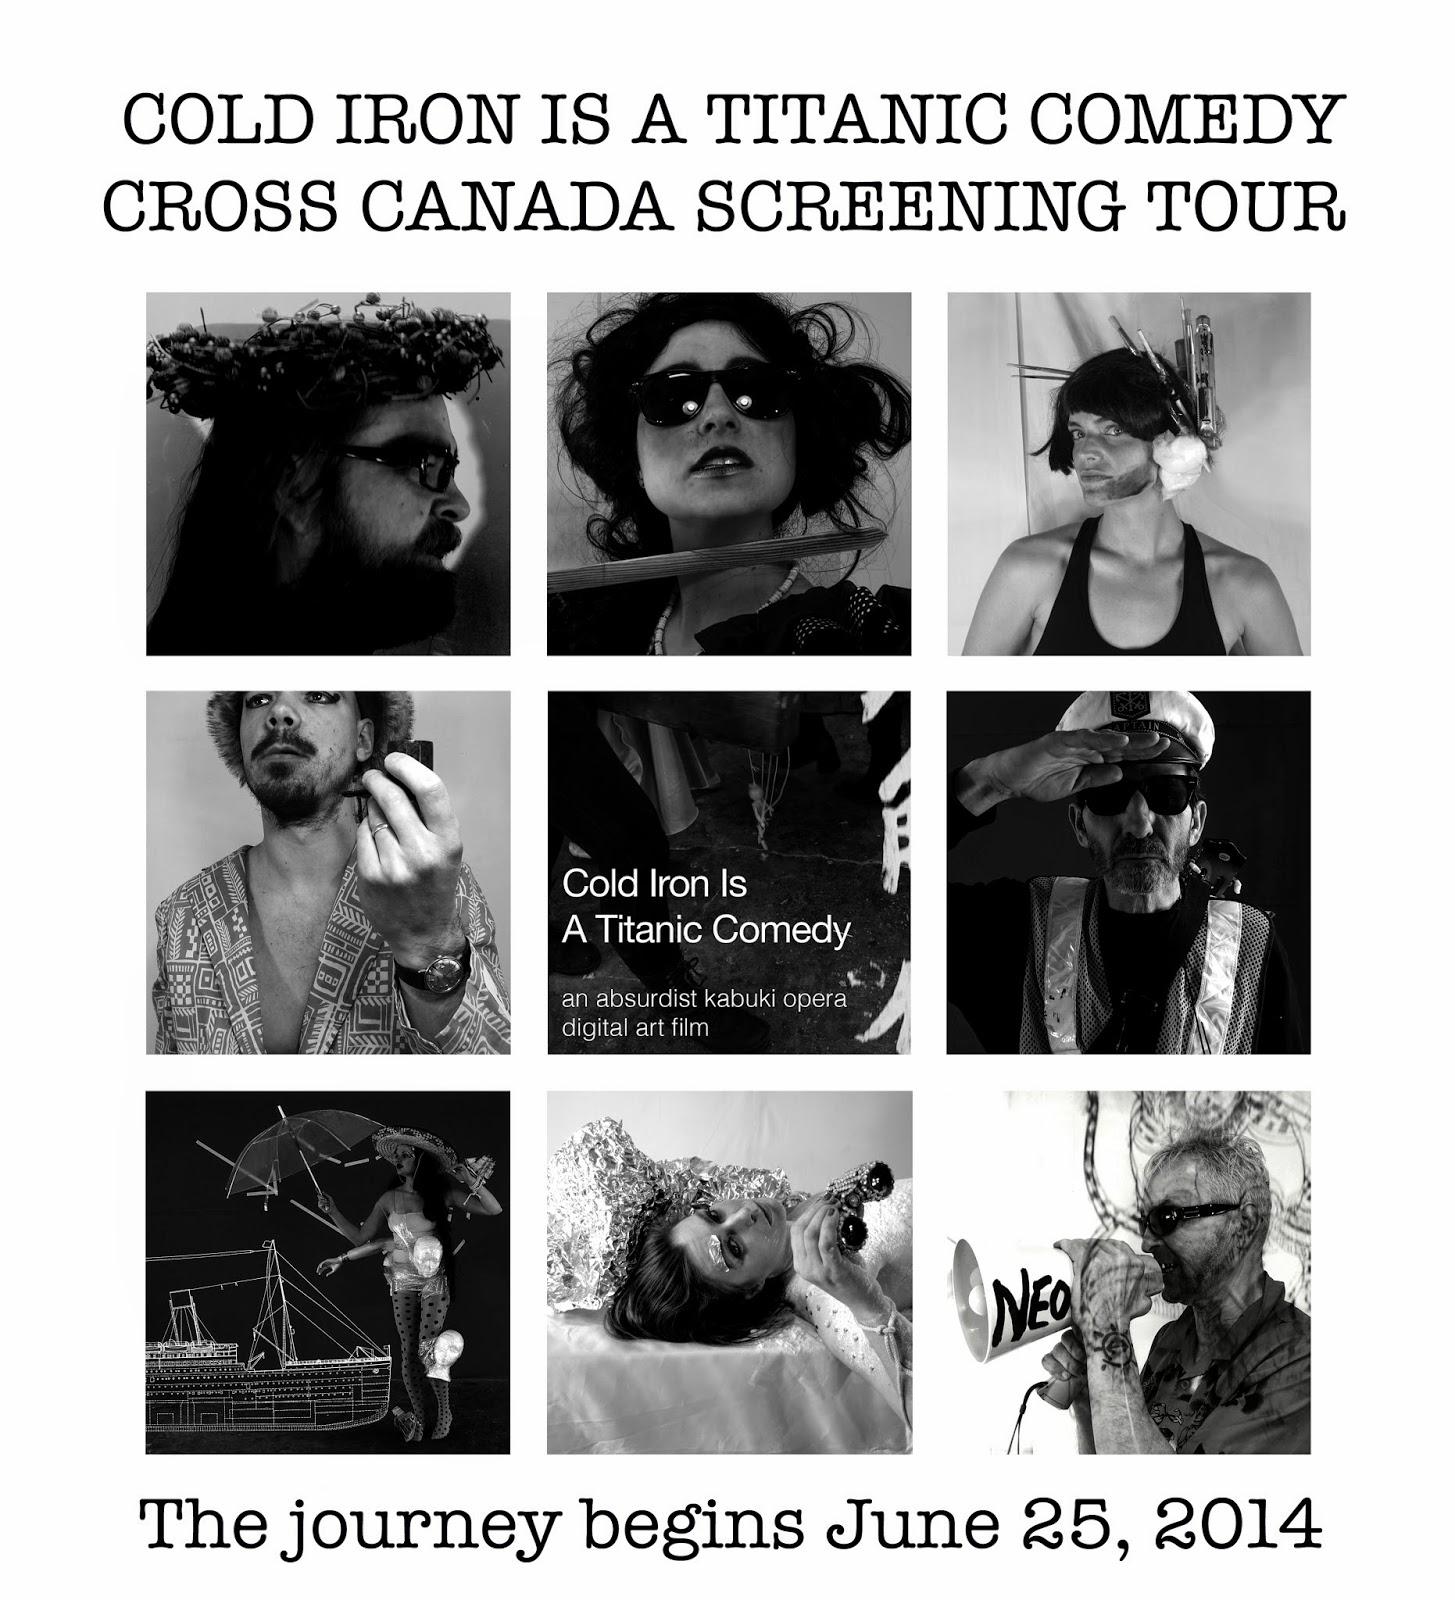 Cross Canada Screening Tour 2014